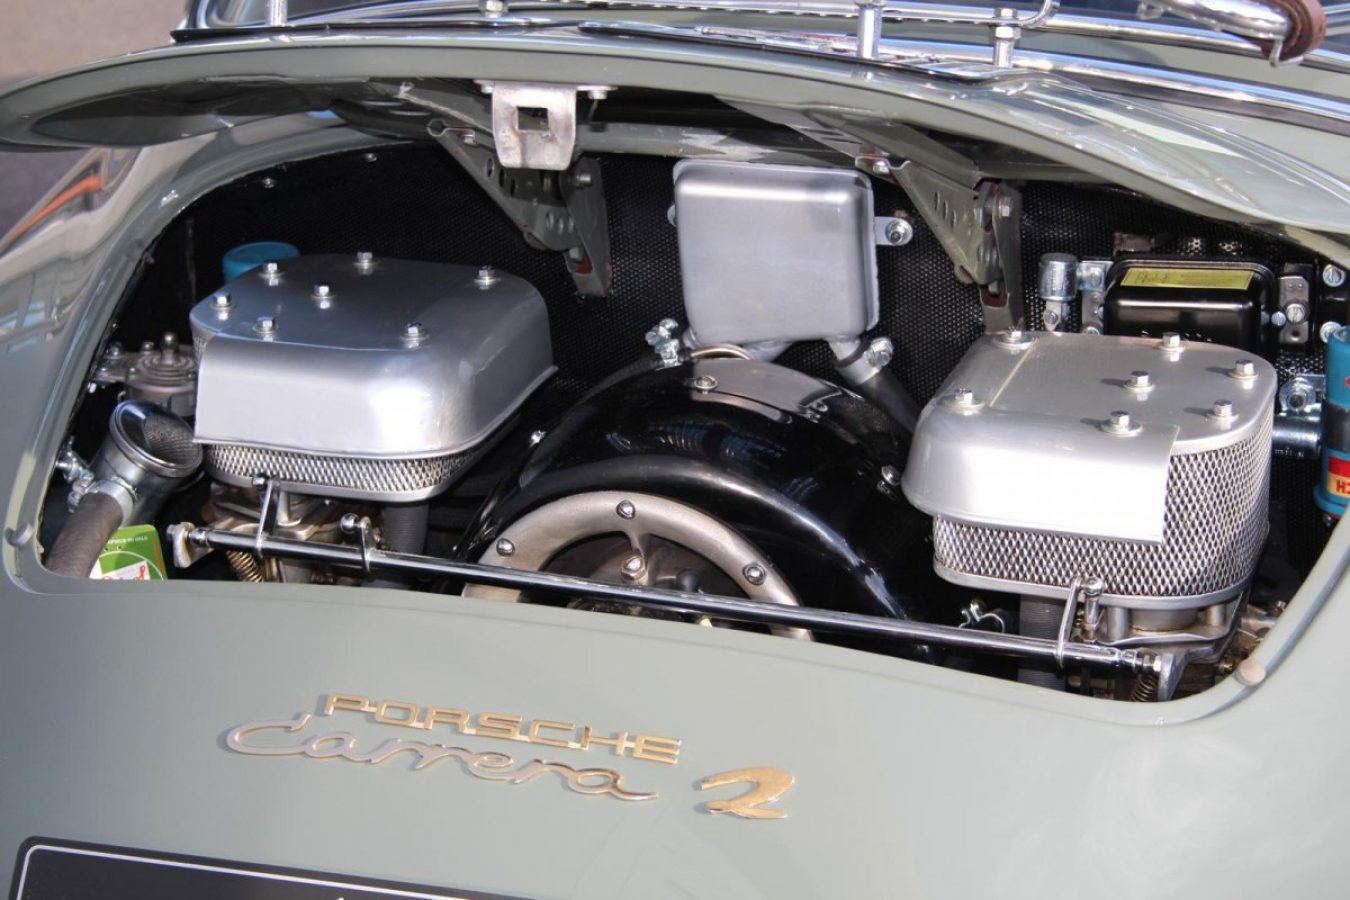 Porsche 356 Carrera Cabriolet 2000 GS 2